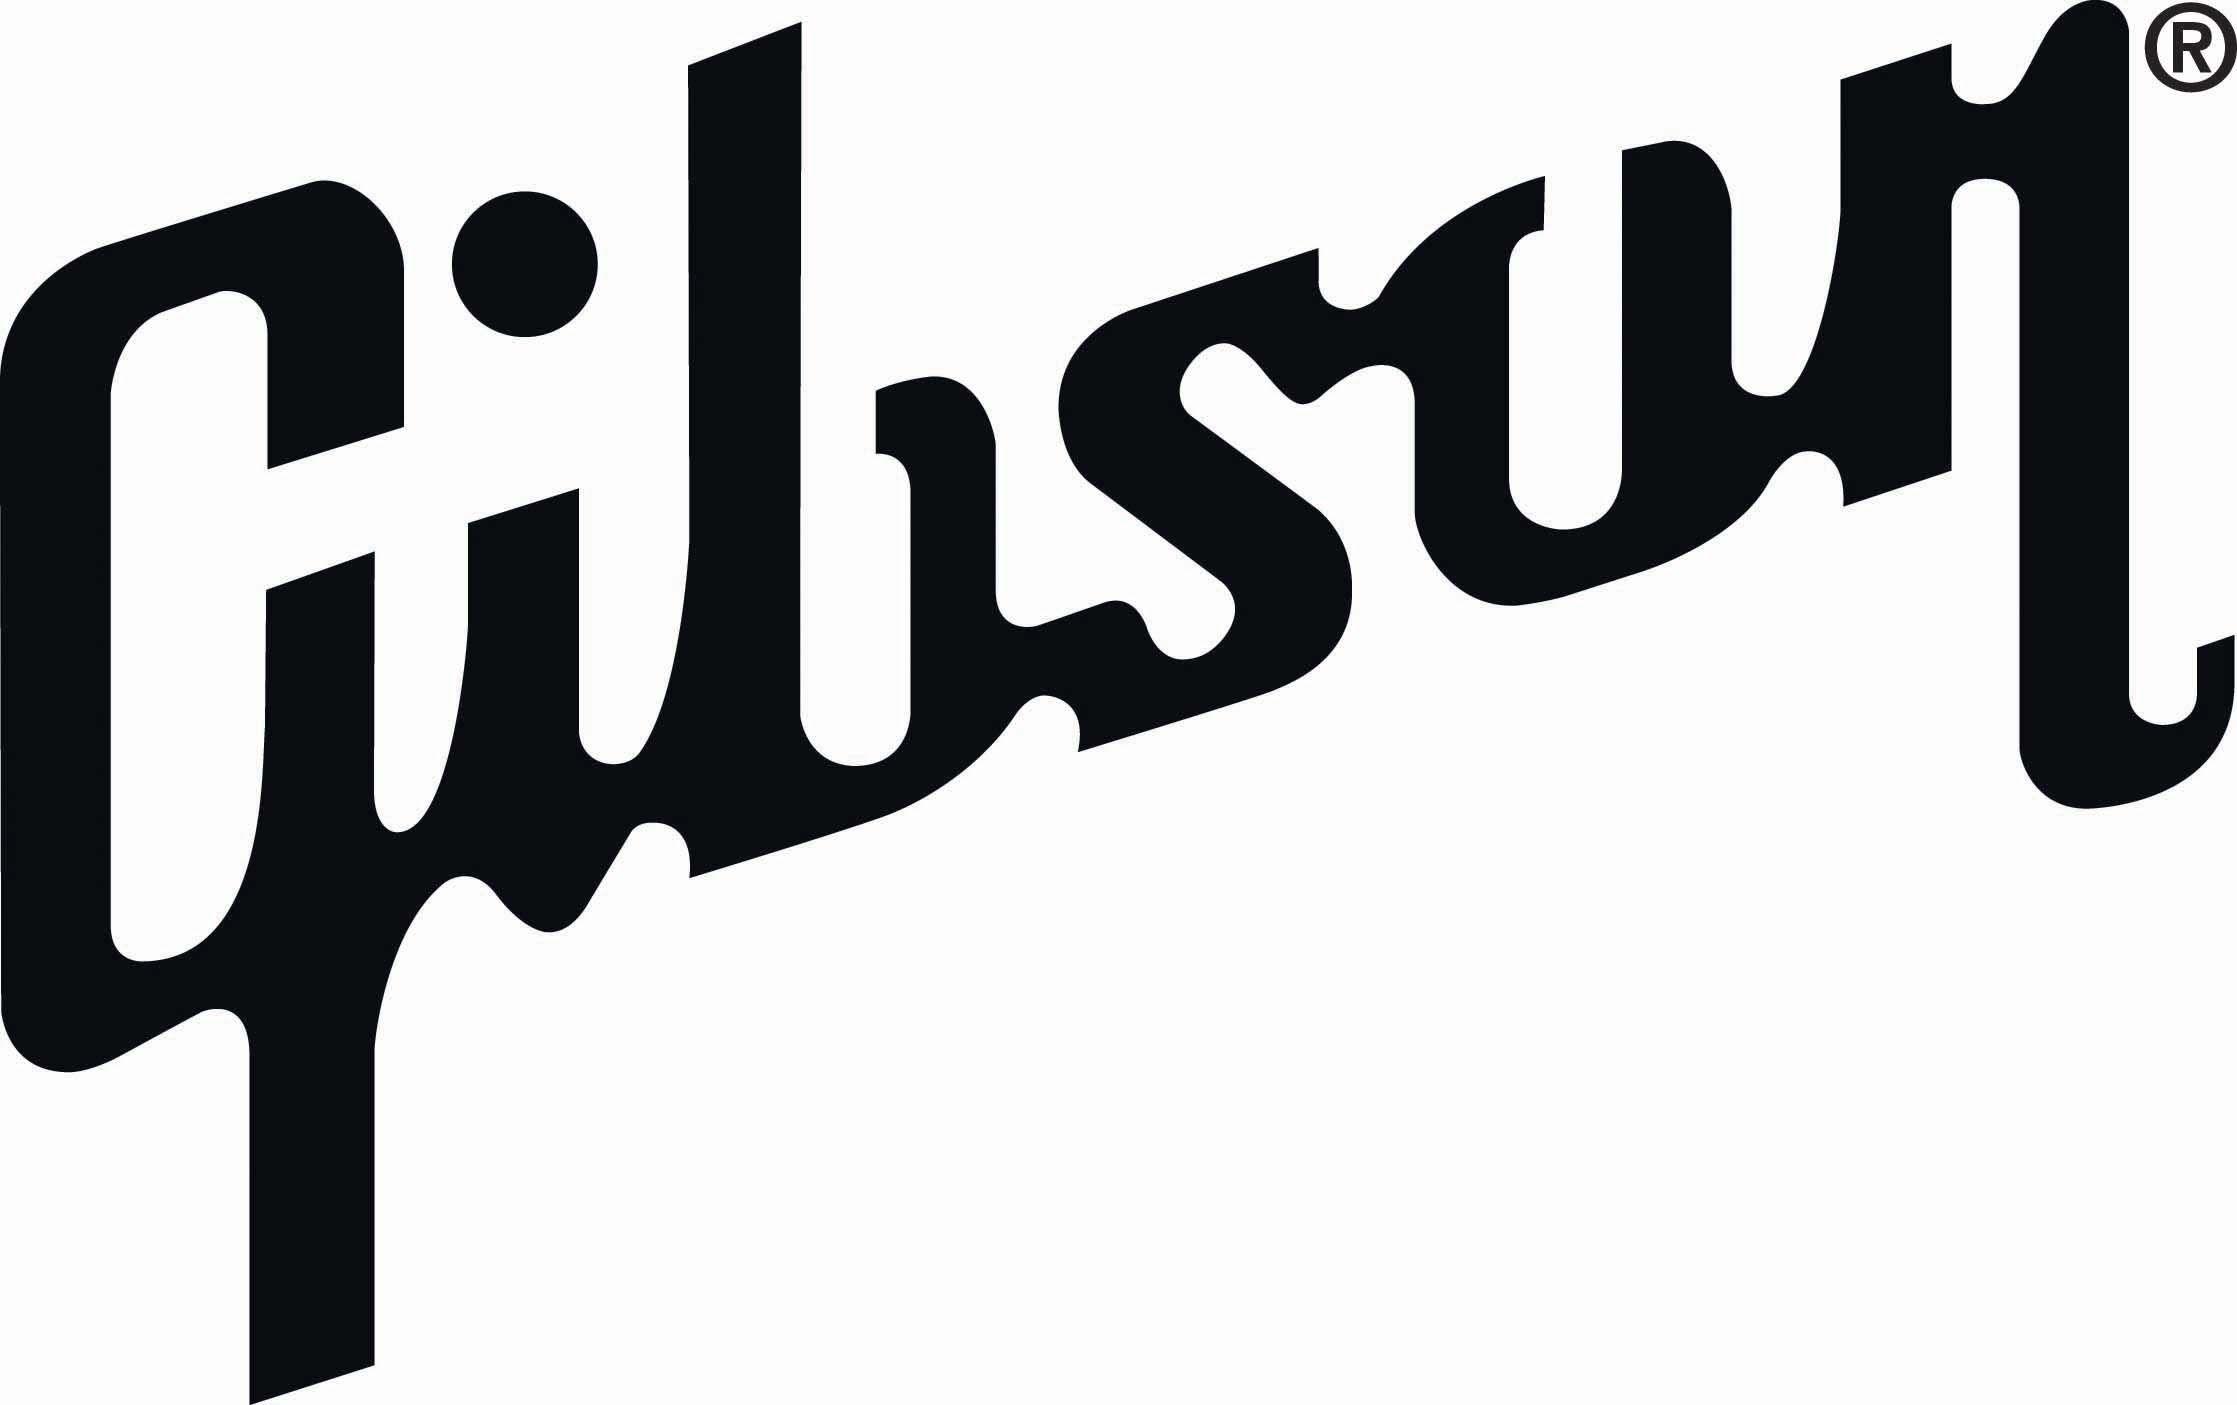 pin by kanin arayasomboon on logo gibson acoustic gibson guitars guitar logo. Black Bedroom Furniture Sets. Home Design Ideas